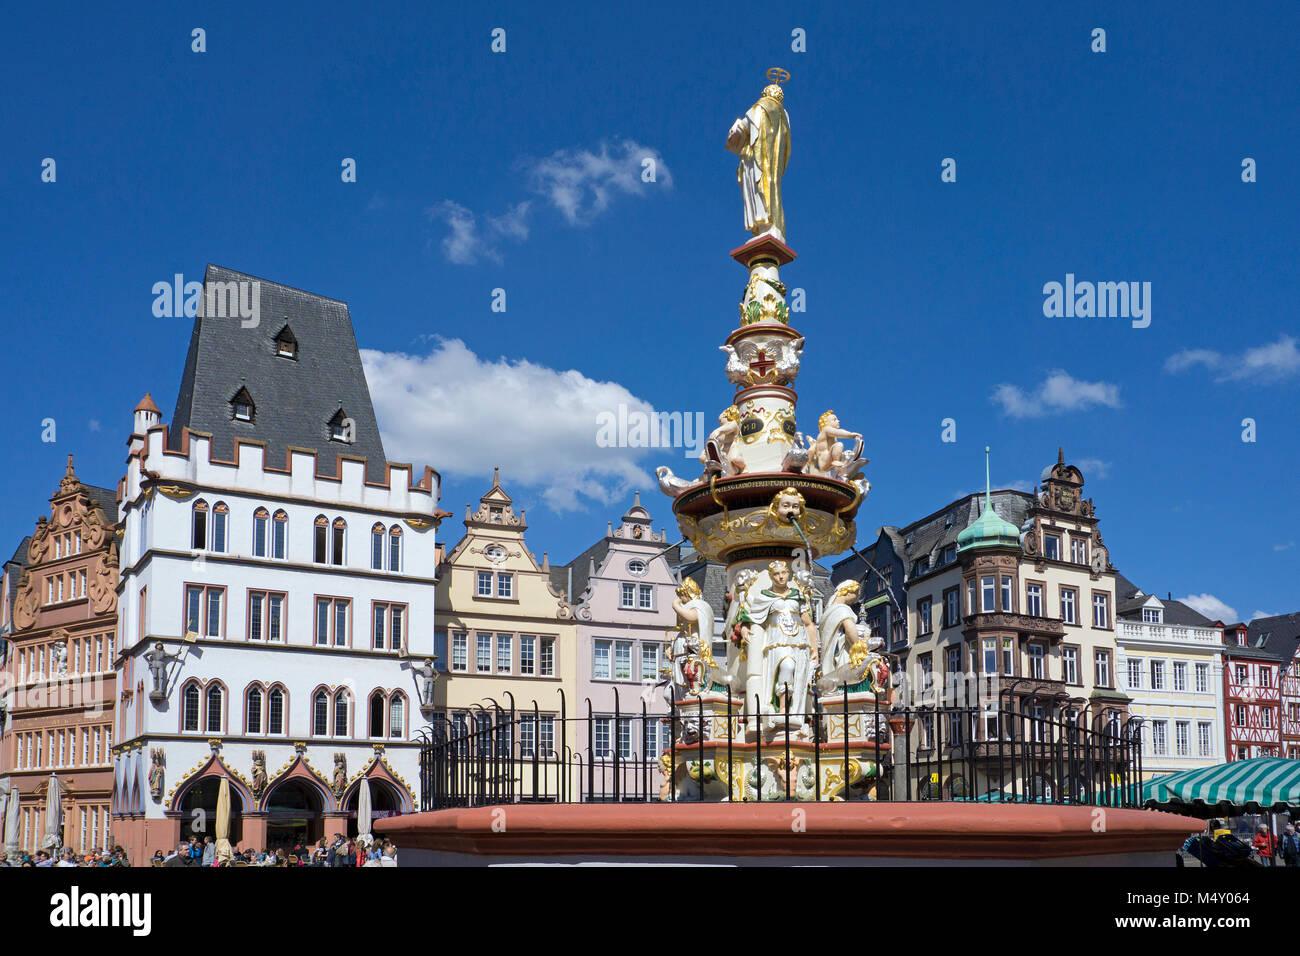 Petrus fountain at main market, Trier, Rhineland-Palatinate, Germany, Europe - Stock Image